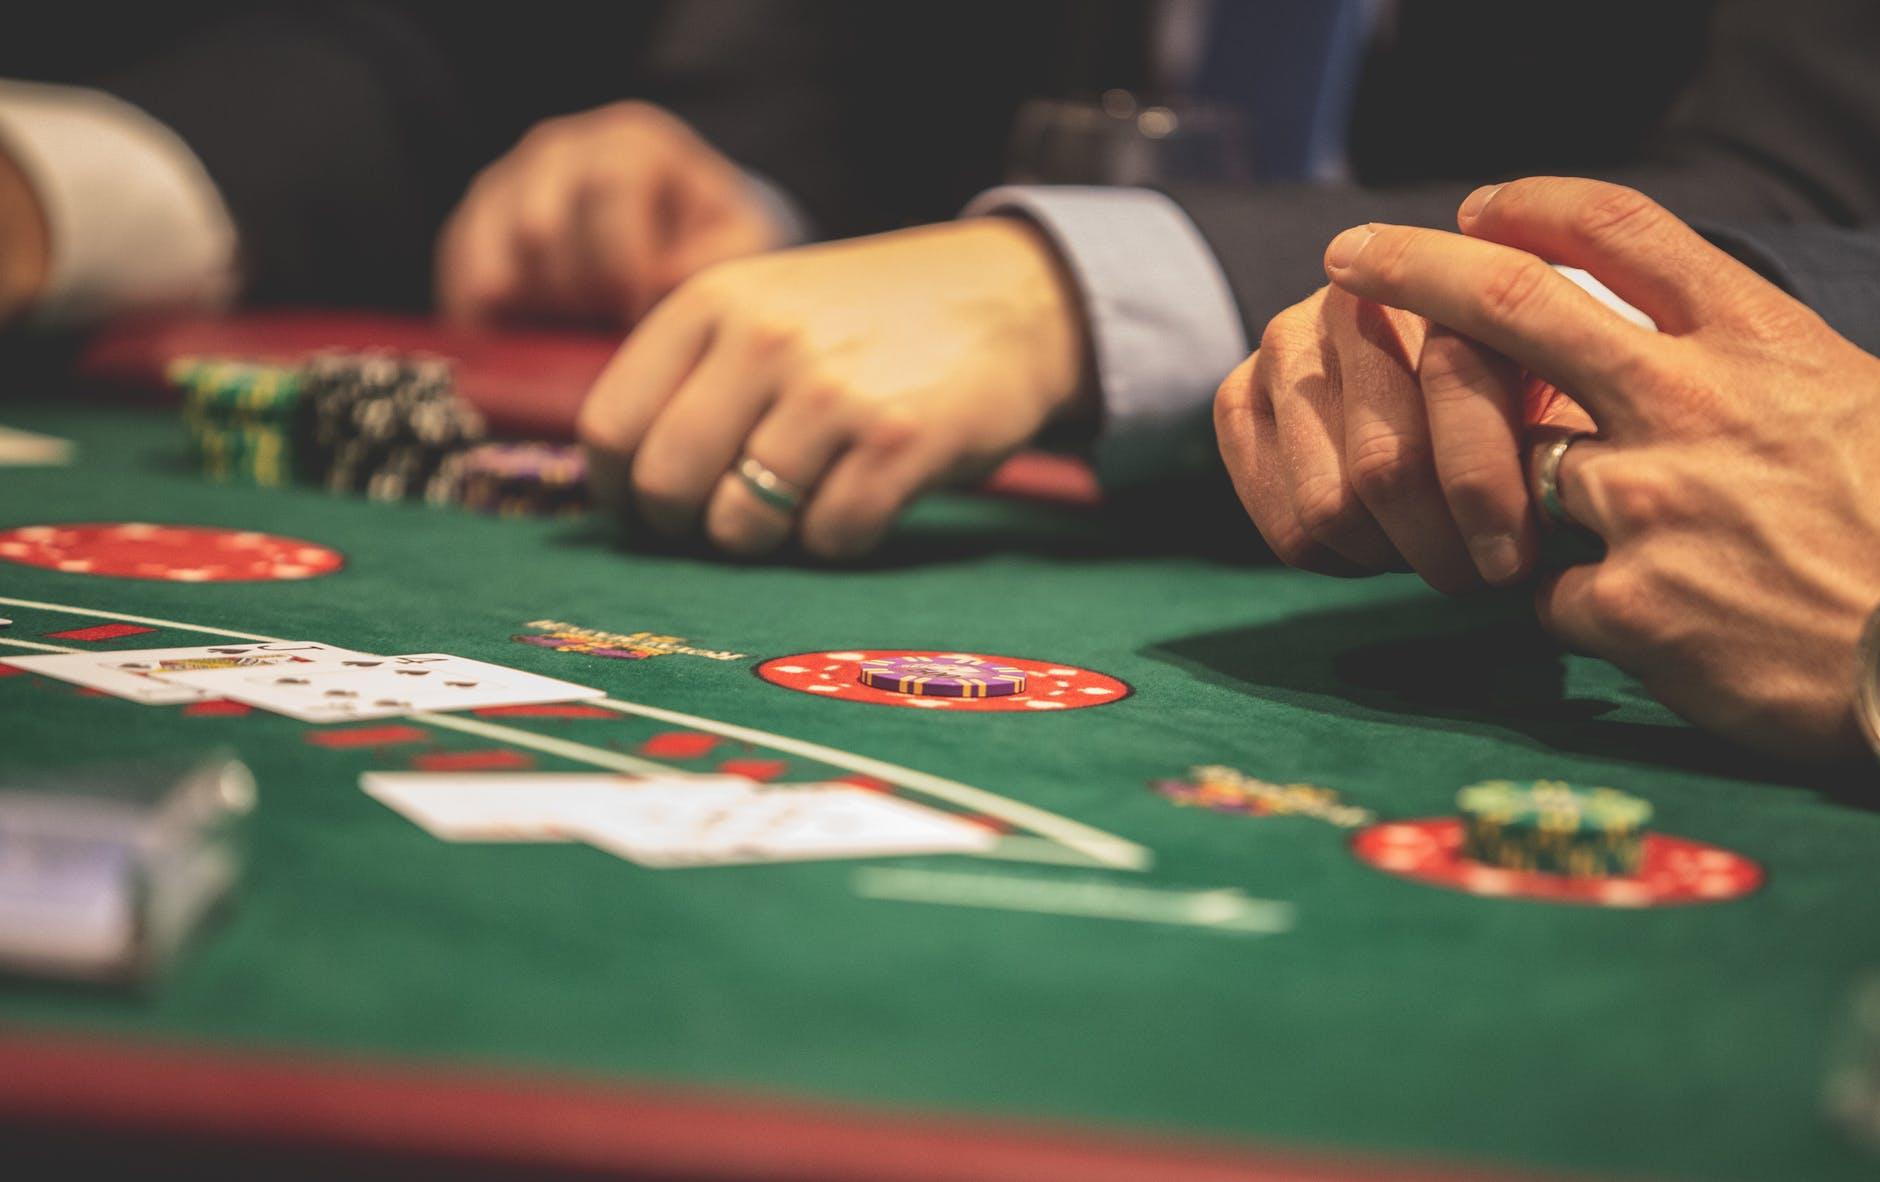 Teknik Tepat Main Casino Online Agar Dapat Kemenangan